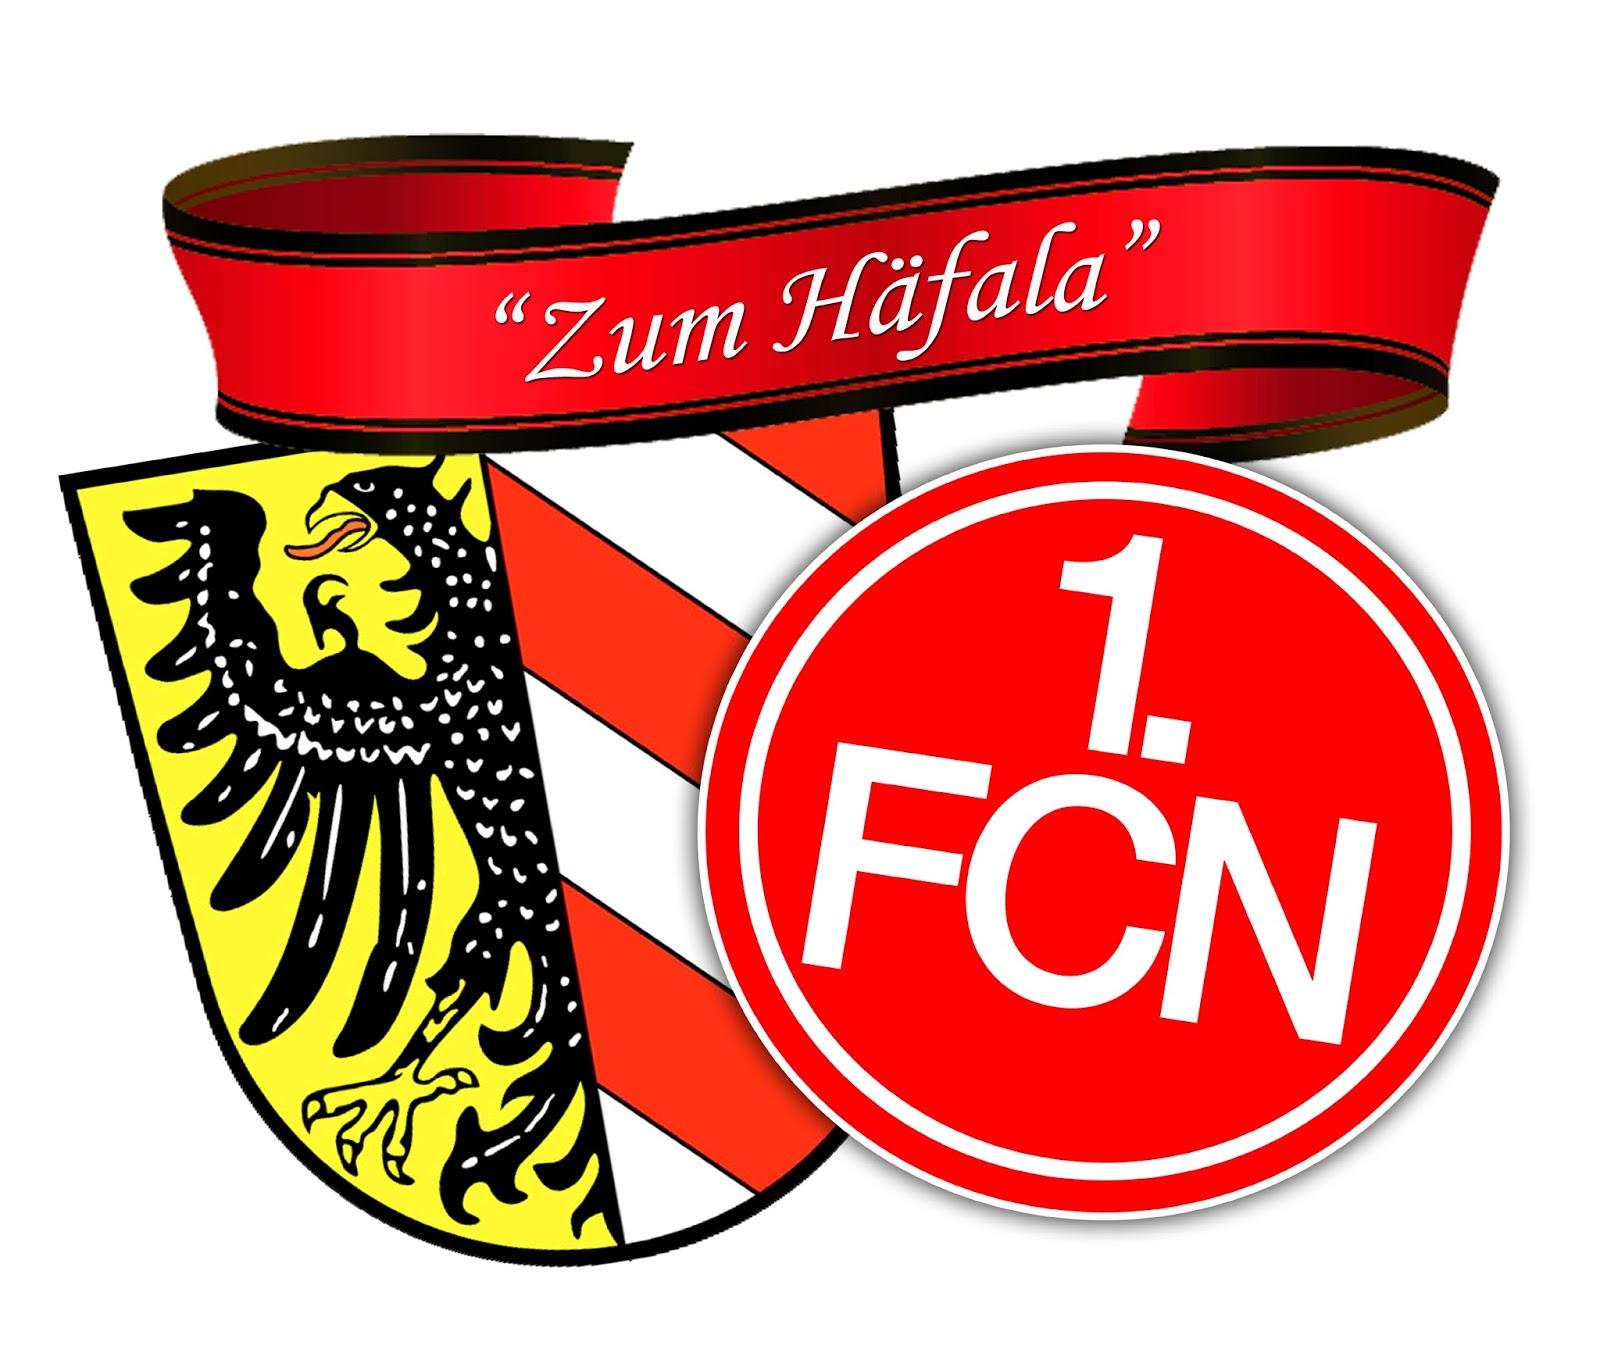 1 fcn logo: